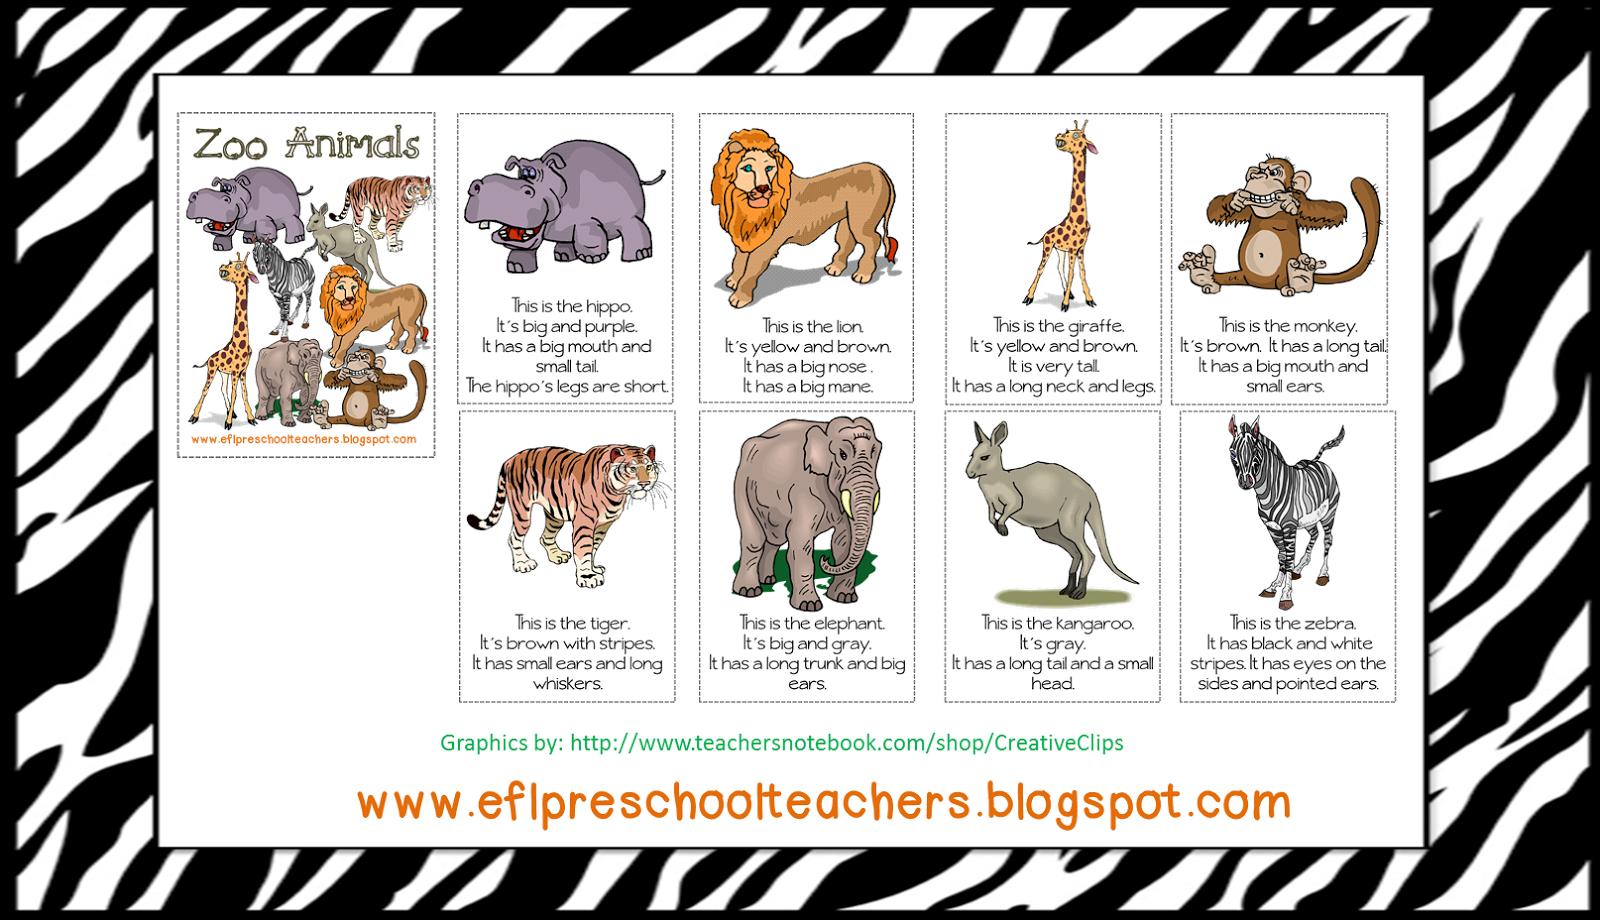 Esl Efl Preschool Teachers Zoo Or Jungle Theme